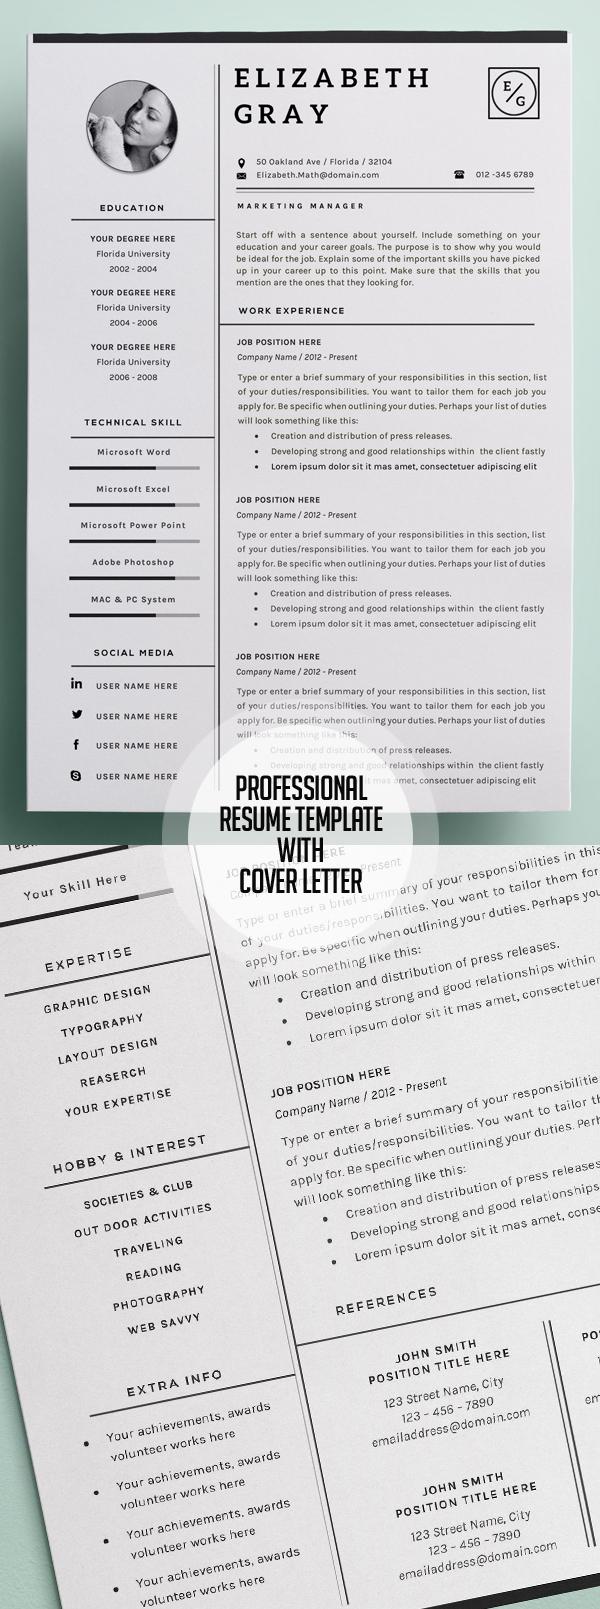 50 Best Minimal Resume Templates - 9